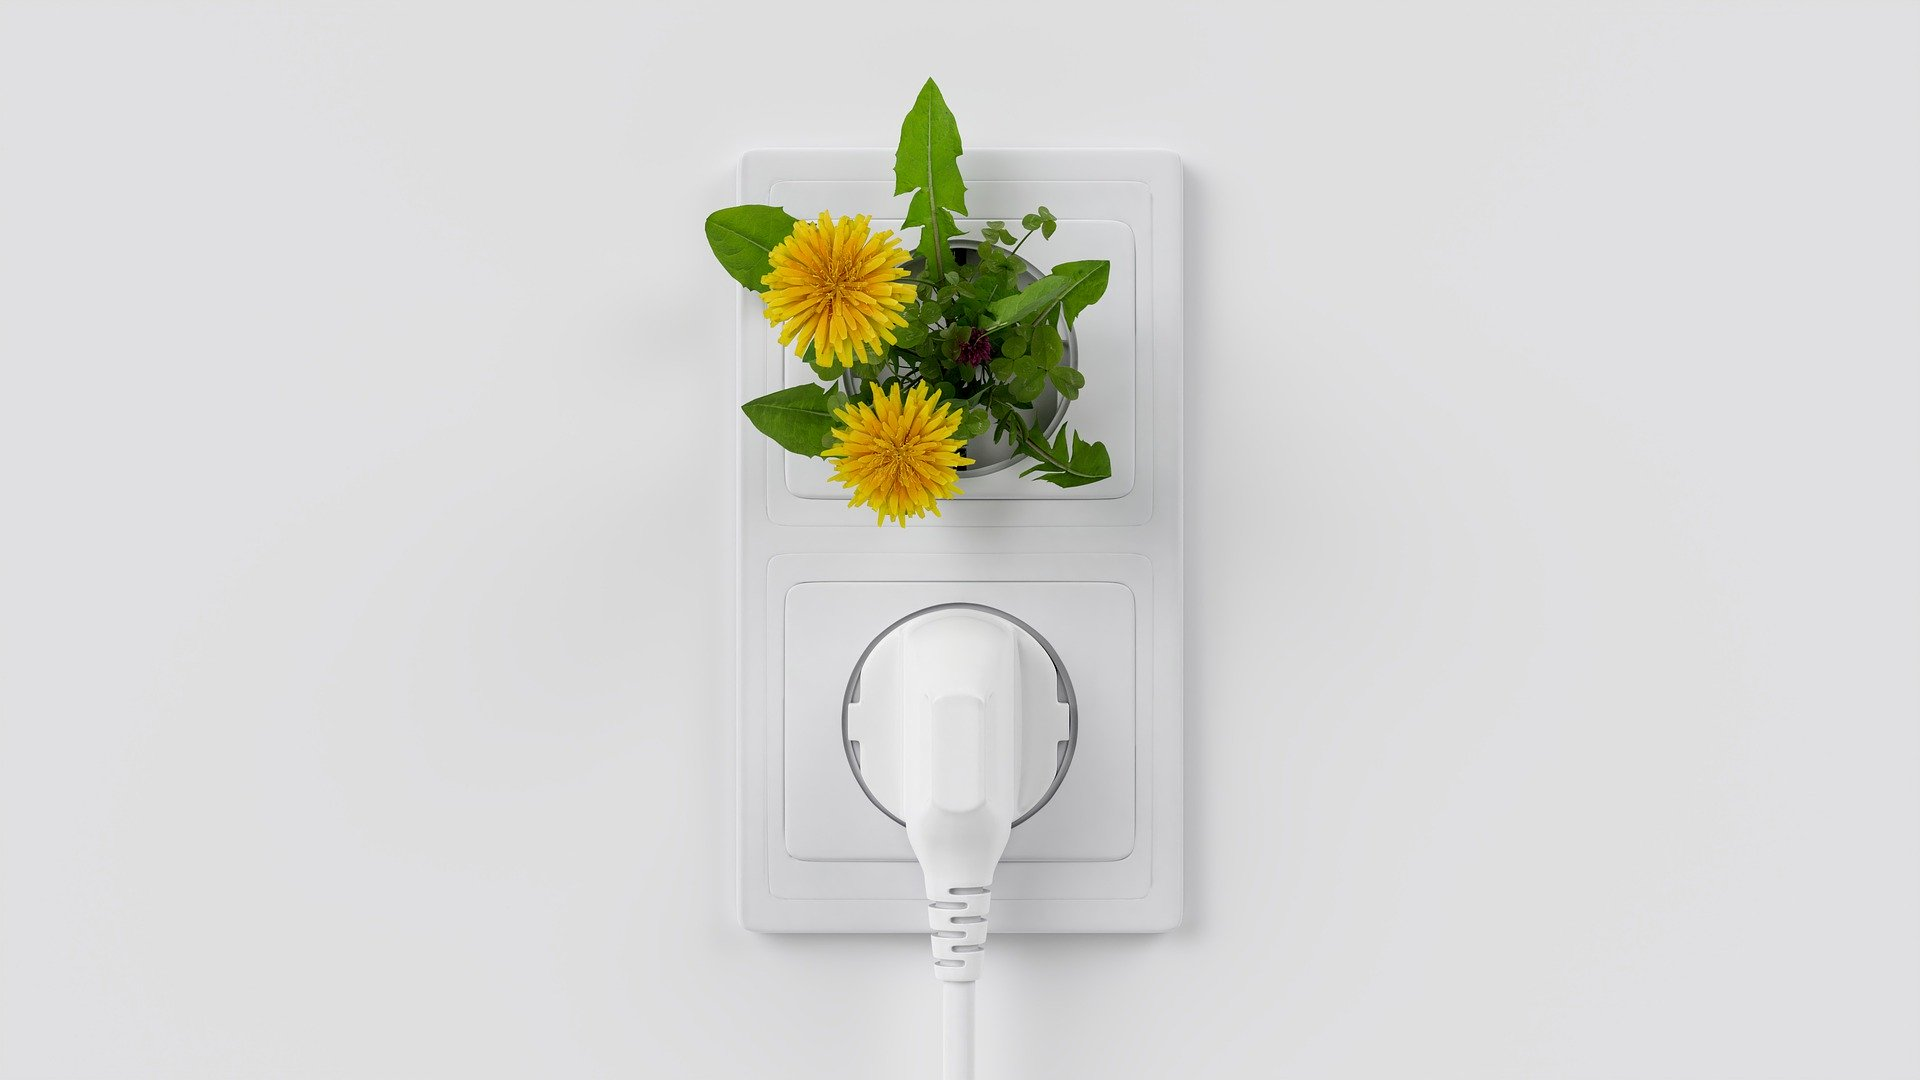 energia rinnovabile easac